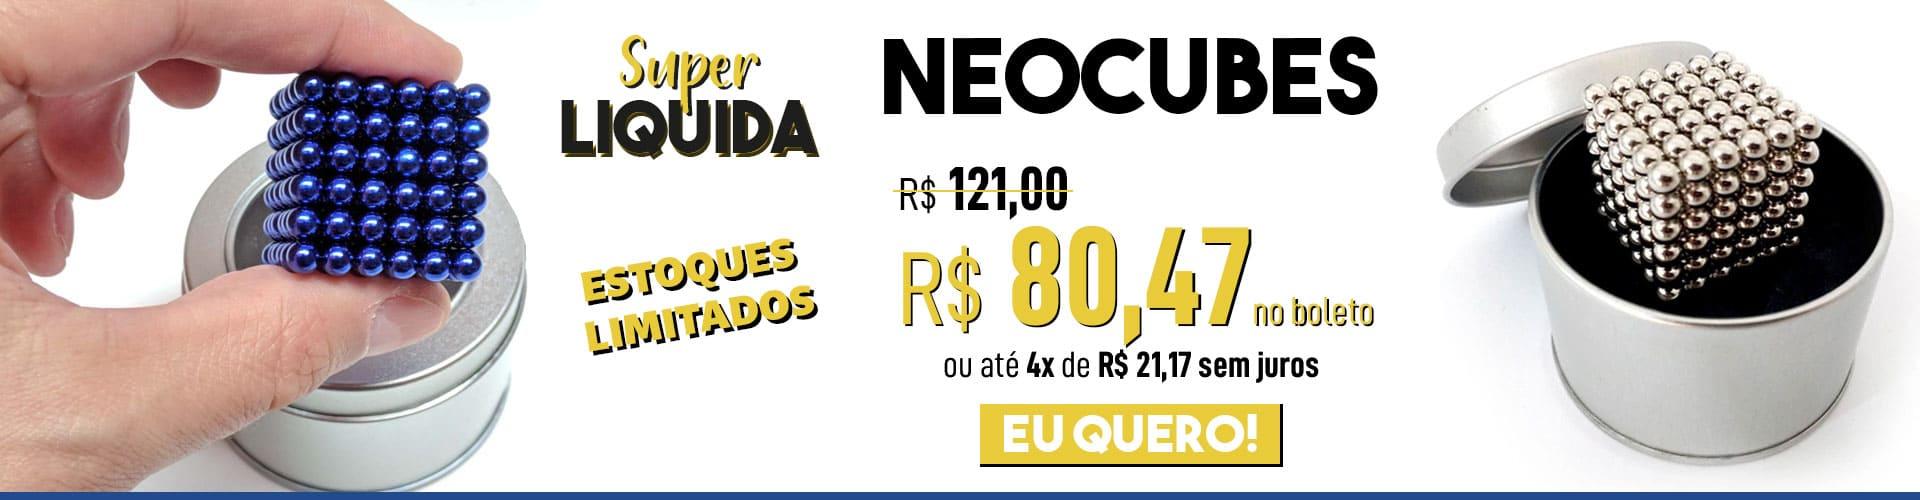 banner principal - Neocube em Oferta